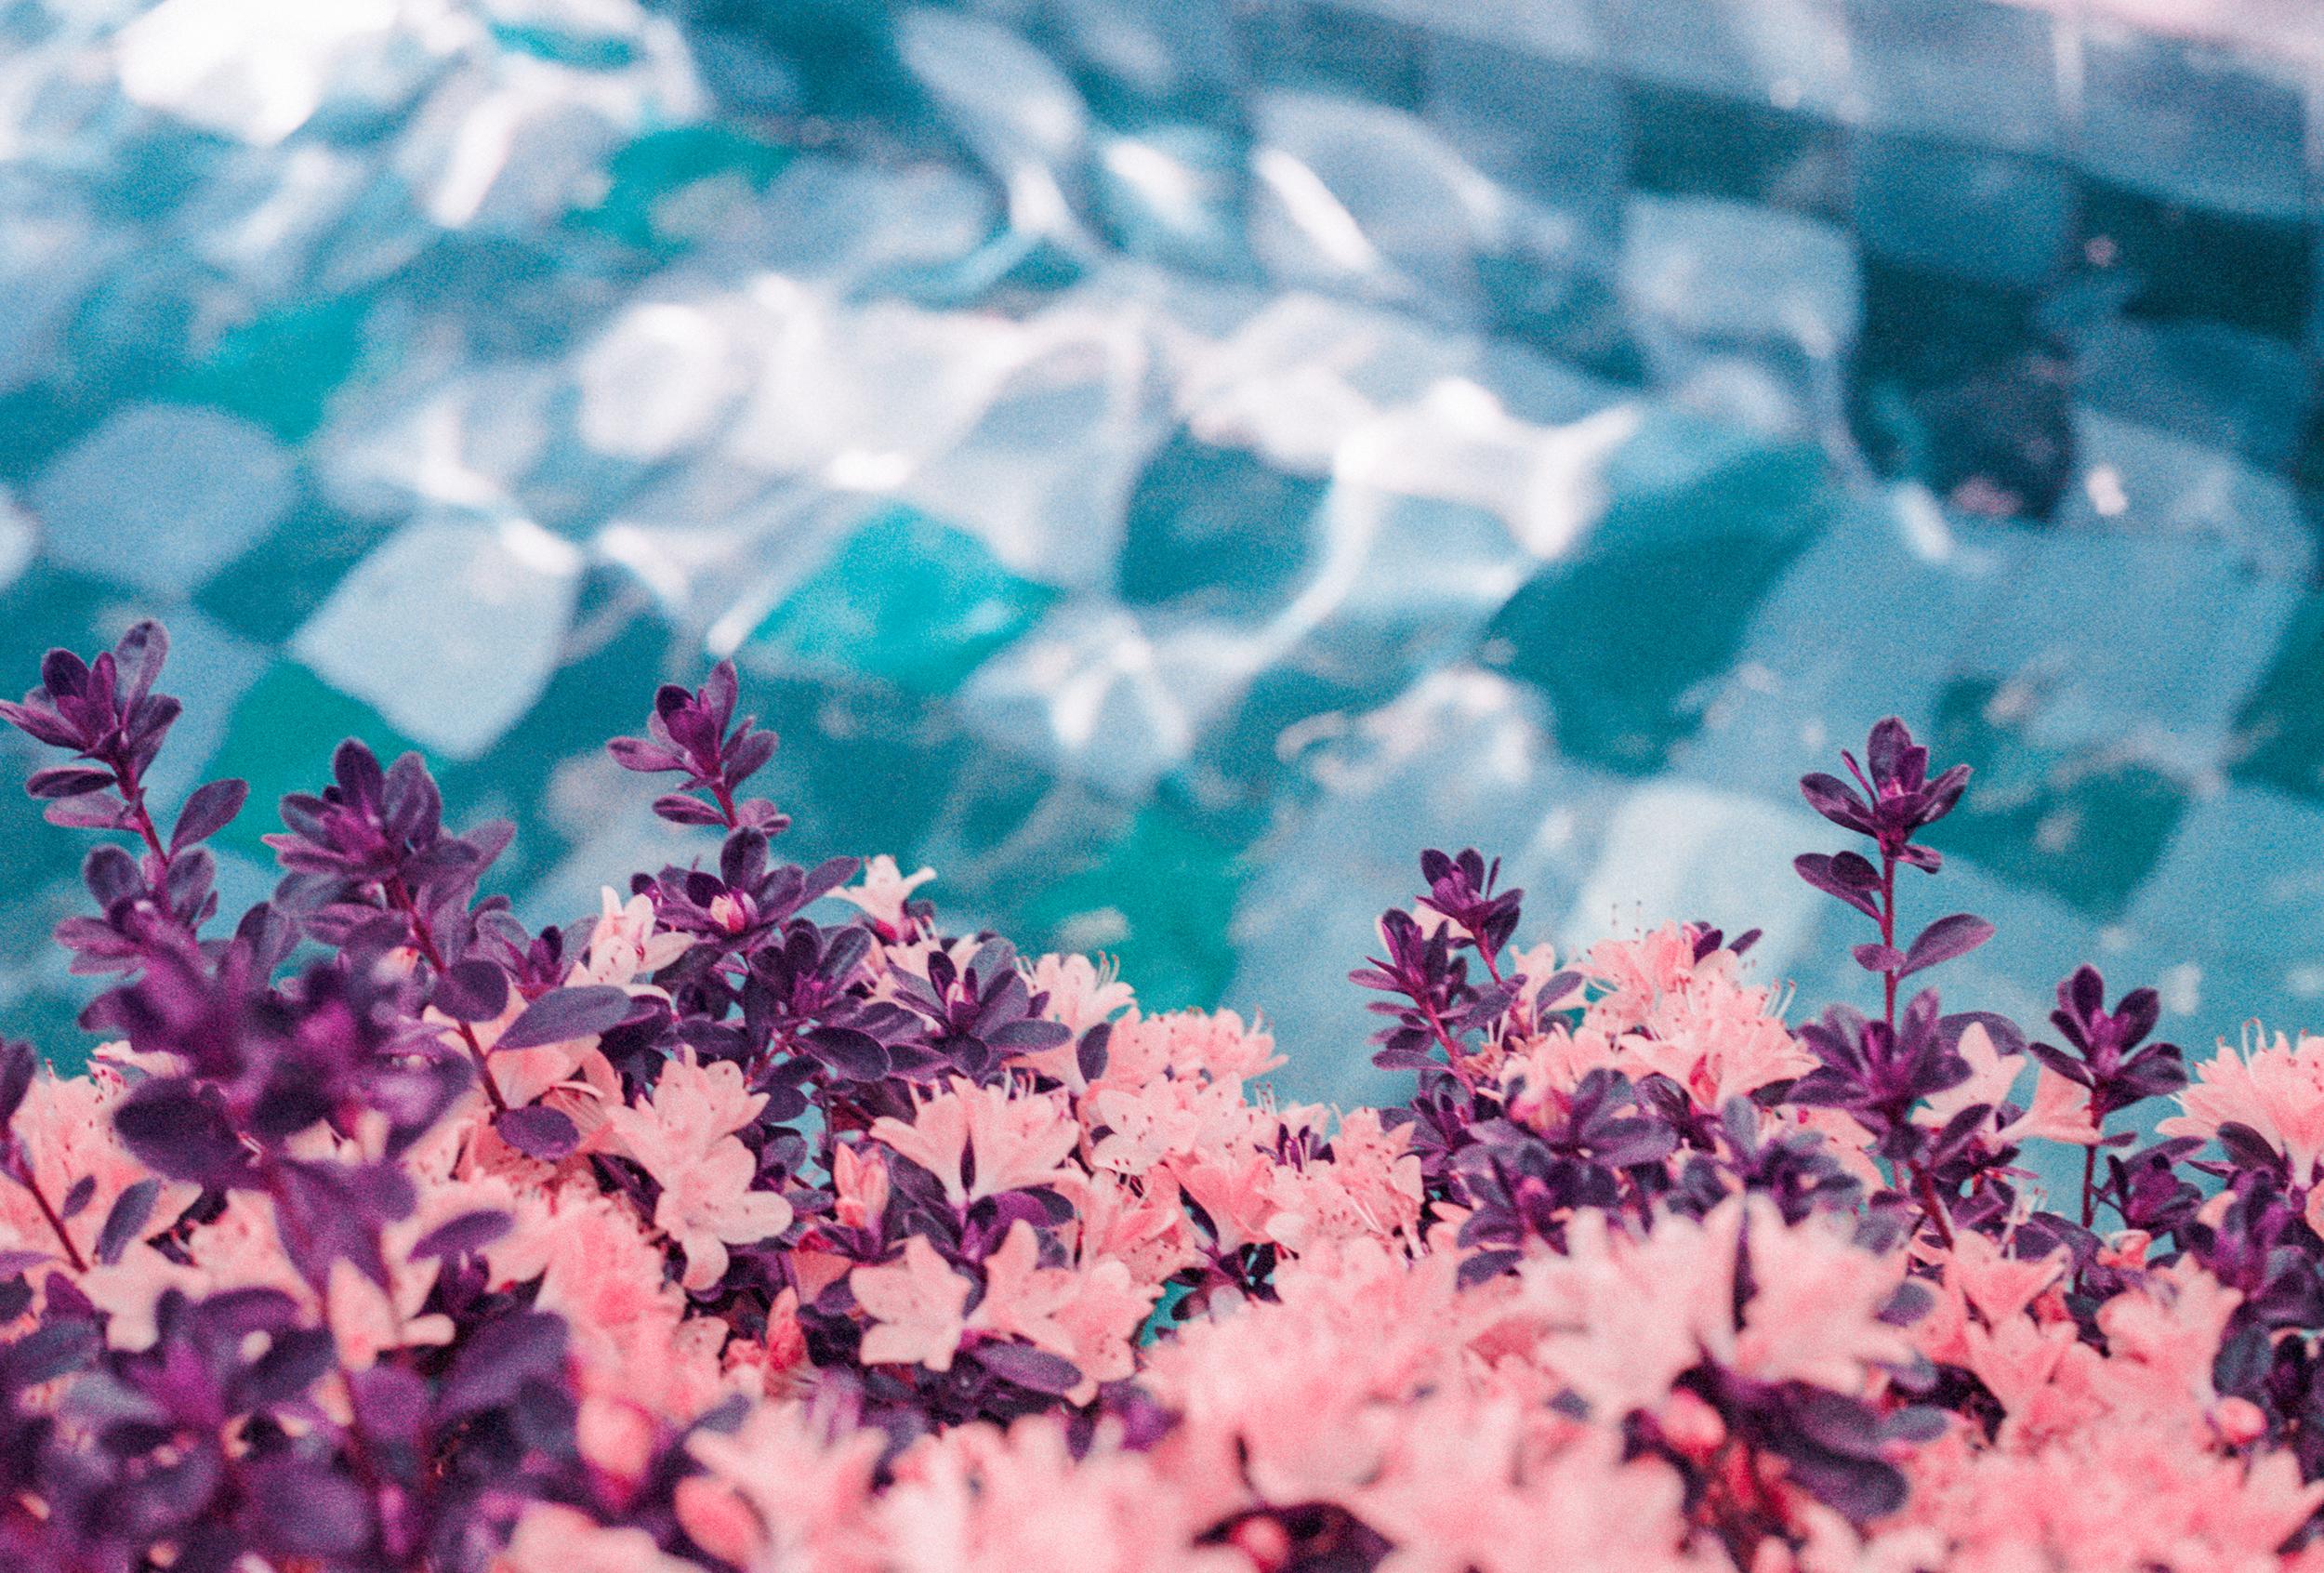 Flowers Dream of Water